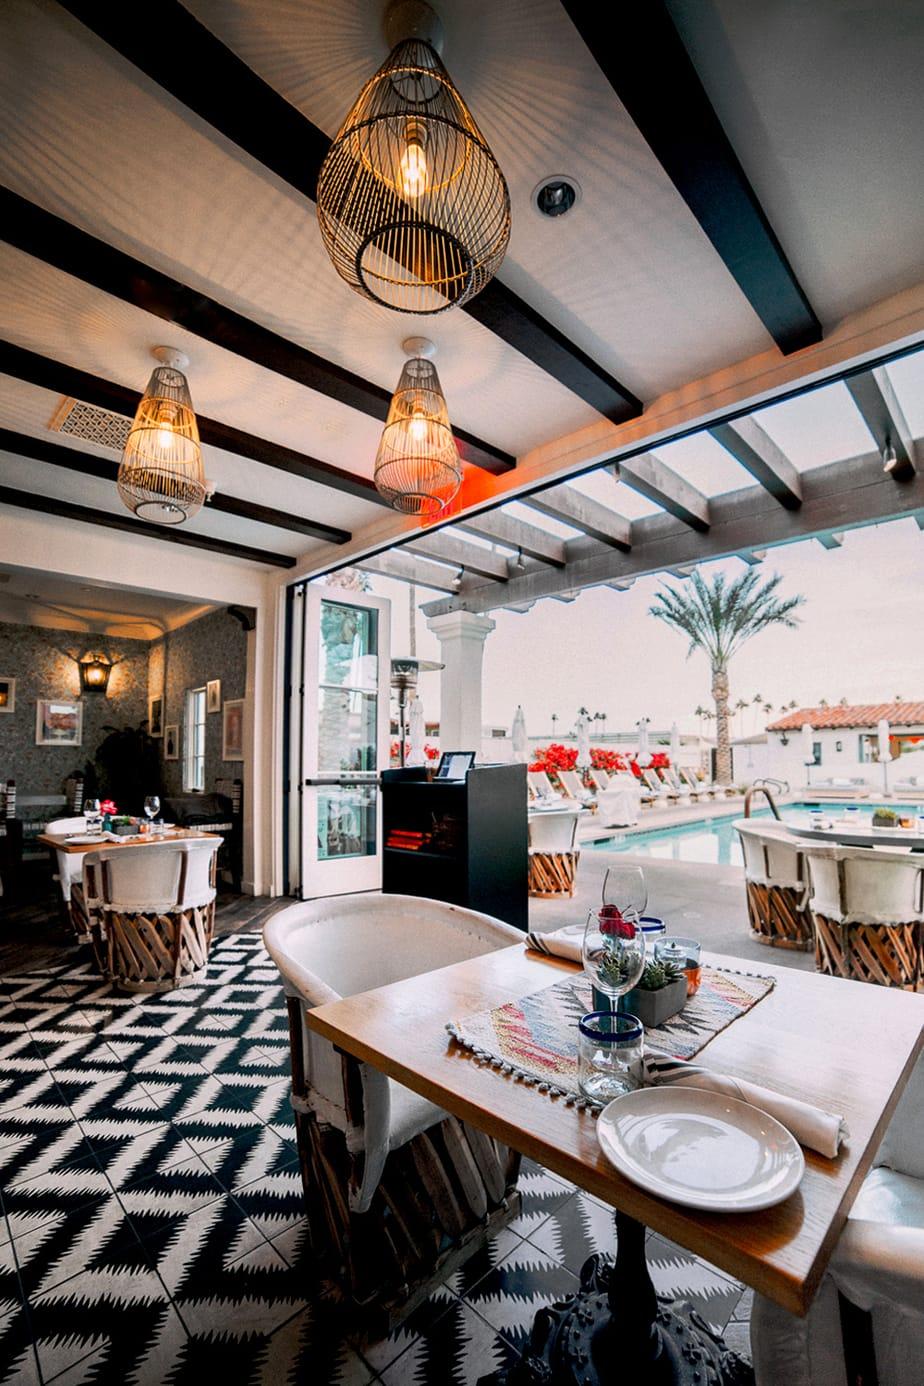 Food & Restaurant Photographer - Los Angeles, California